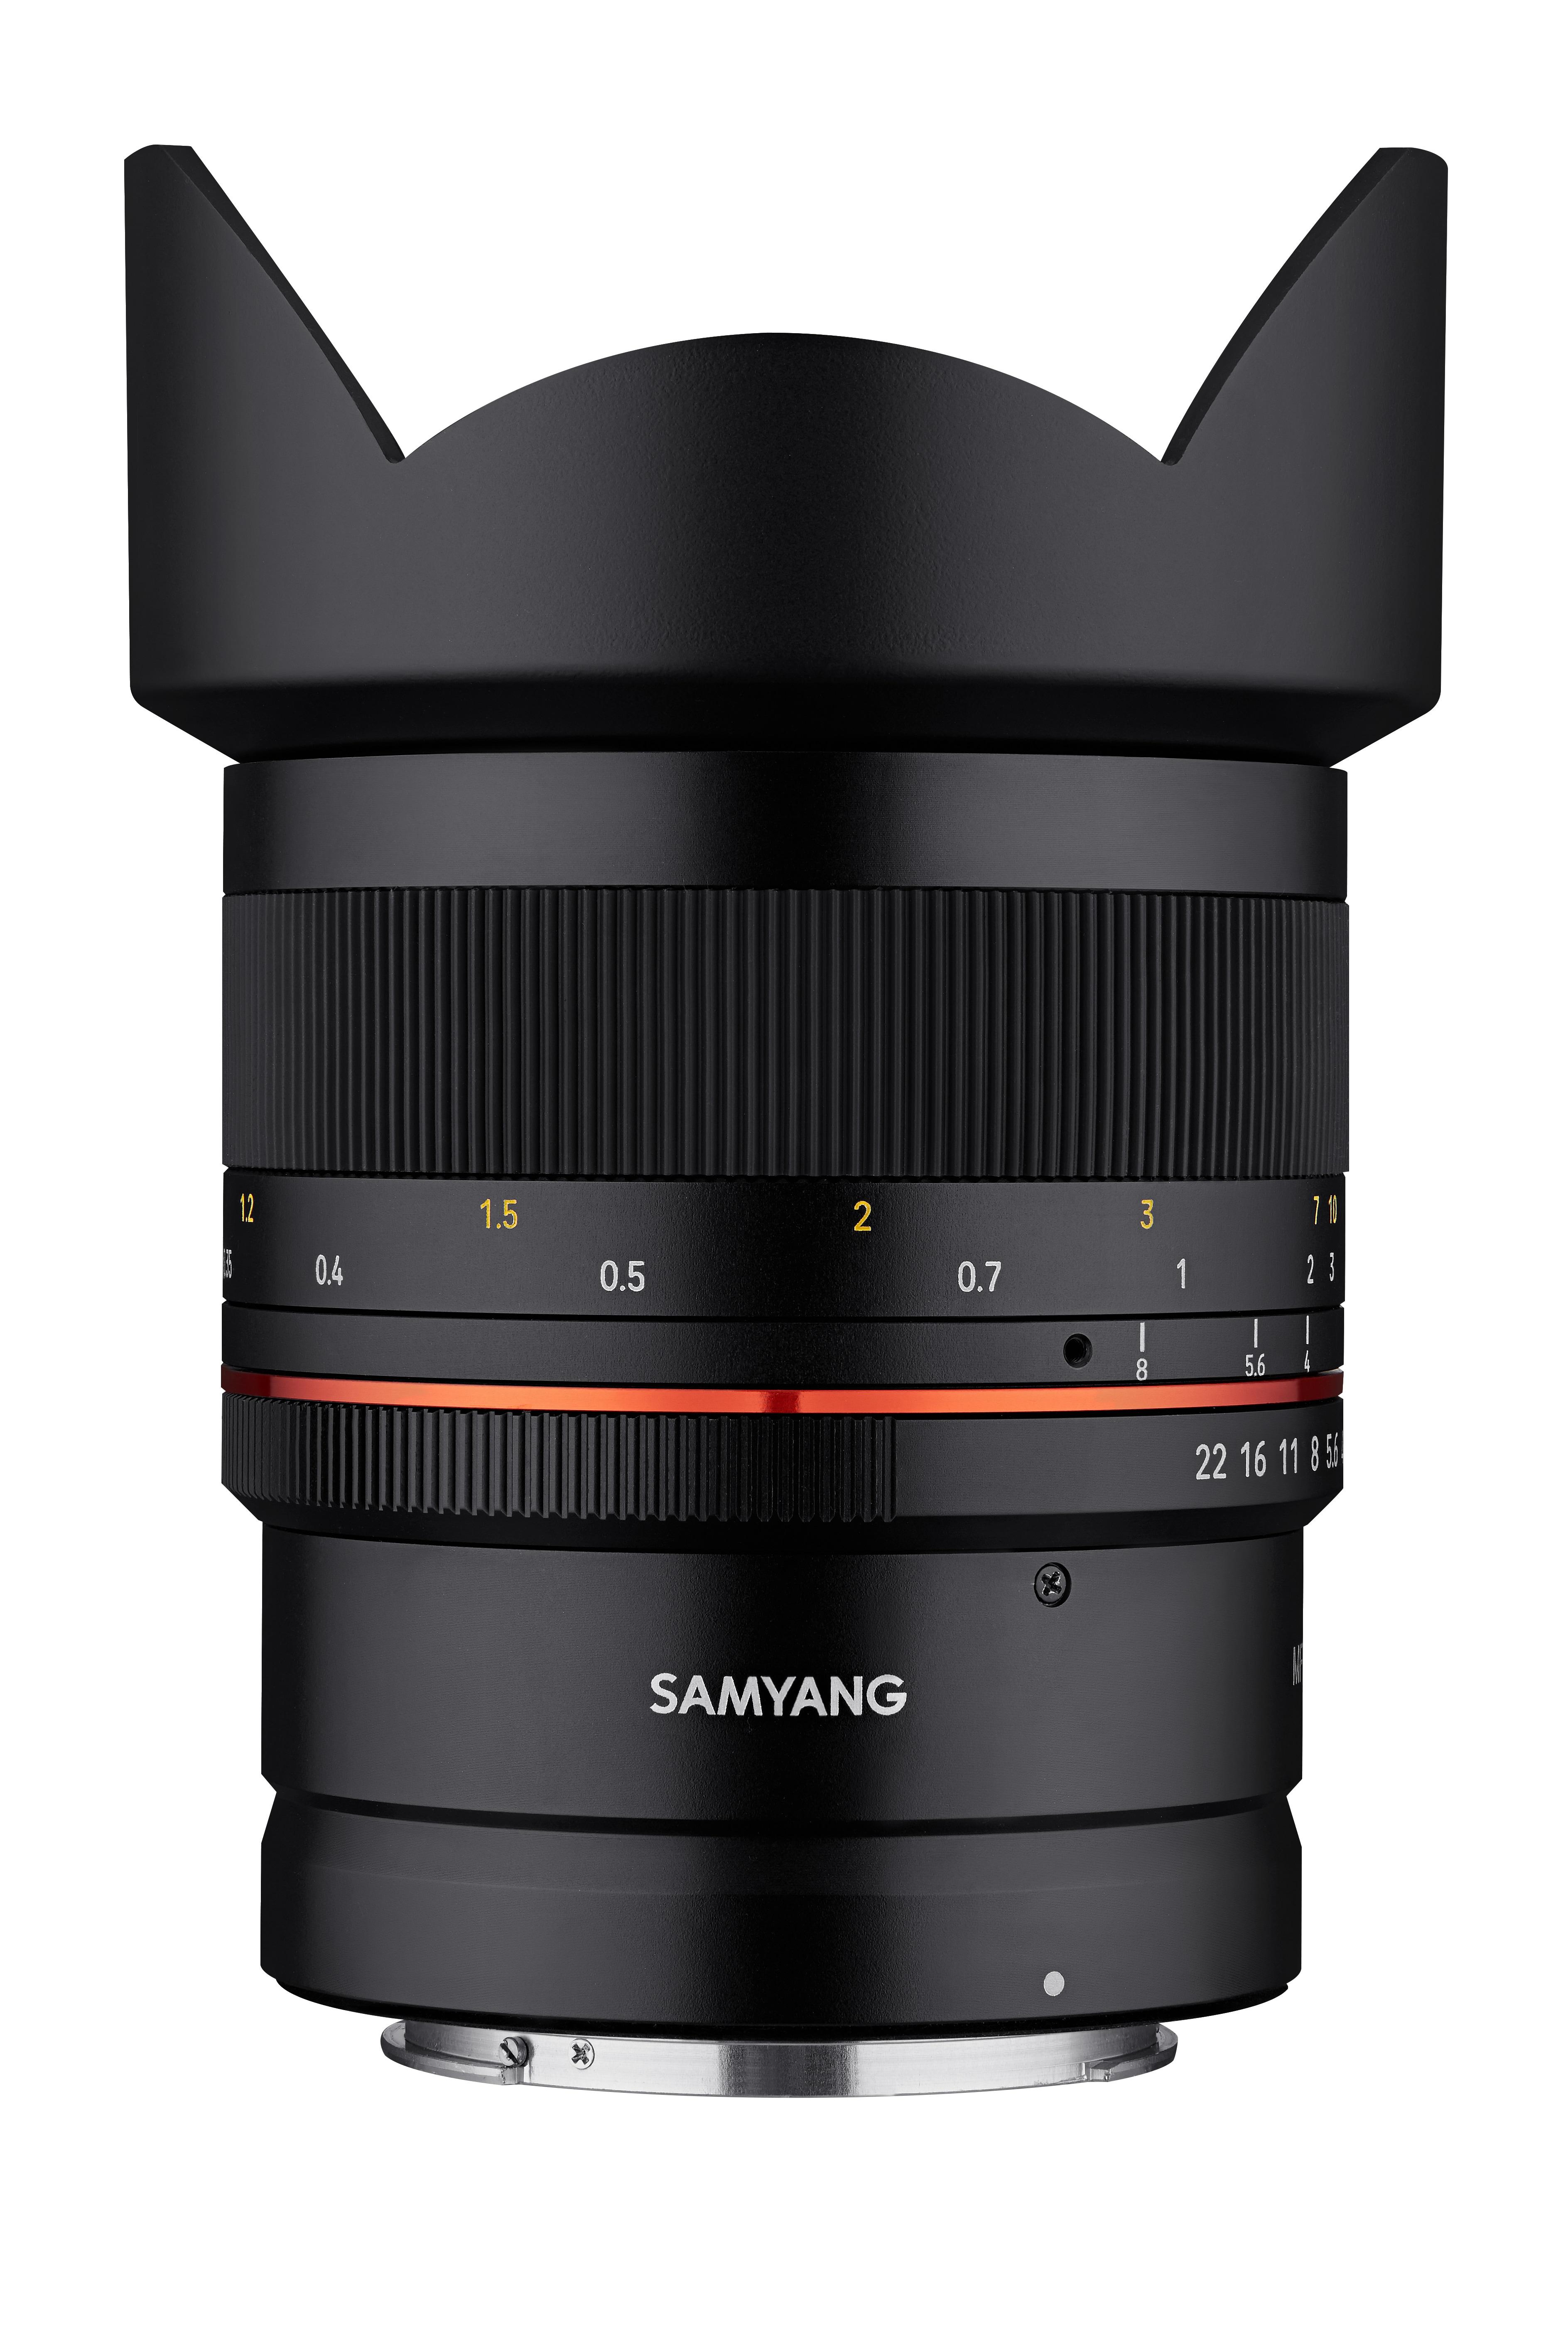 Samyang MF 14mm f/2.8 Canon RF